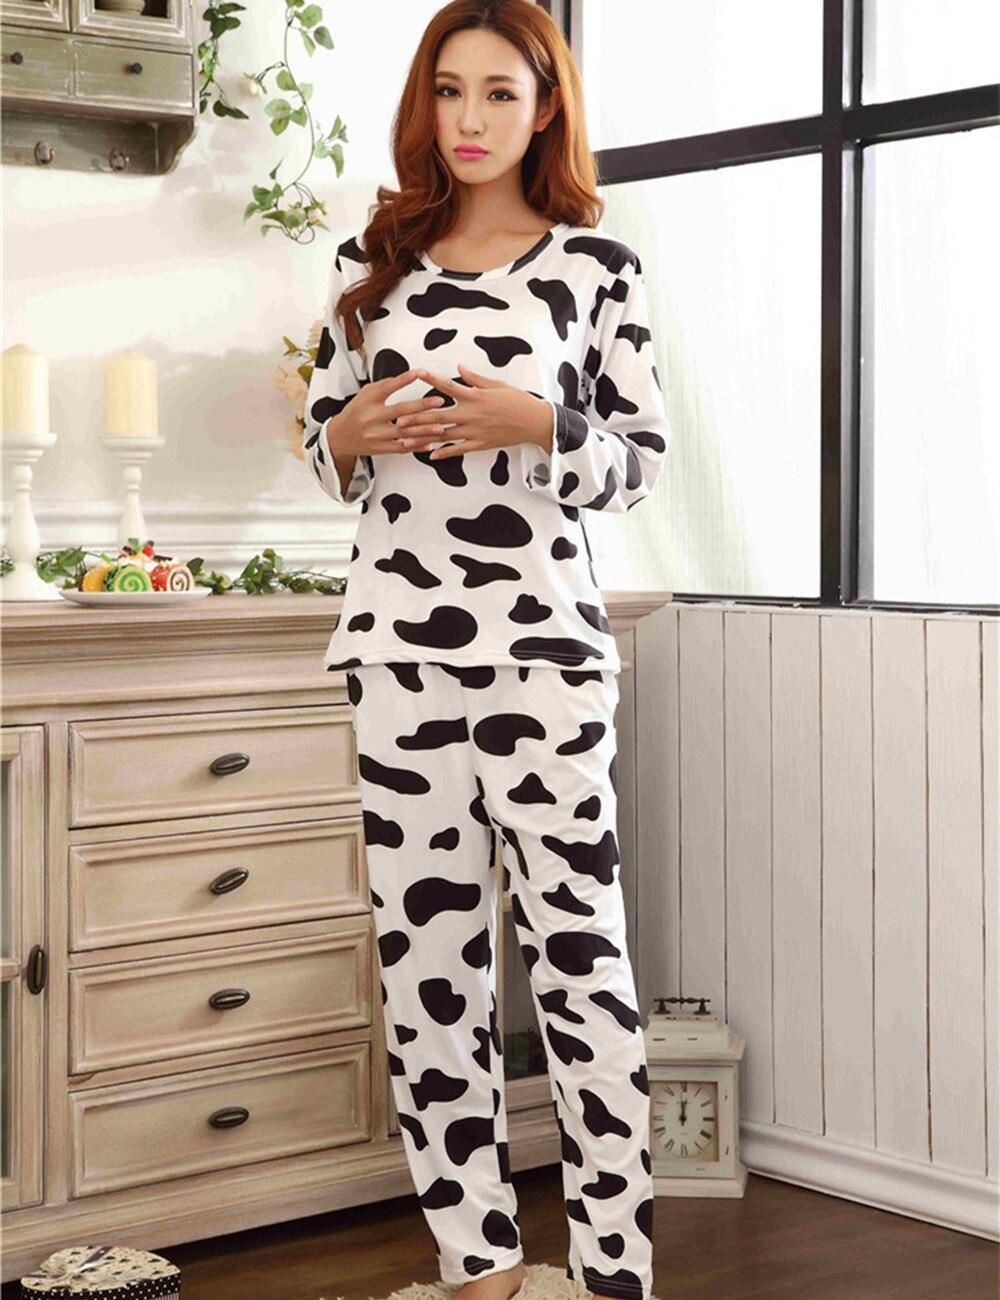 Fashion Women Pijama Pyjamas Full Sleeve Women Pajamas Sets Milk Cow Print Sleepwear Long Pants Women Nightclothes MLXL